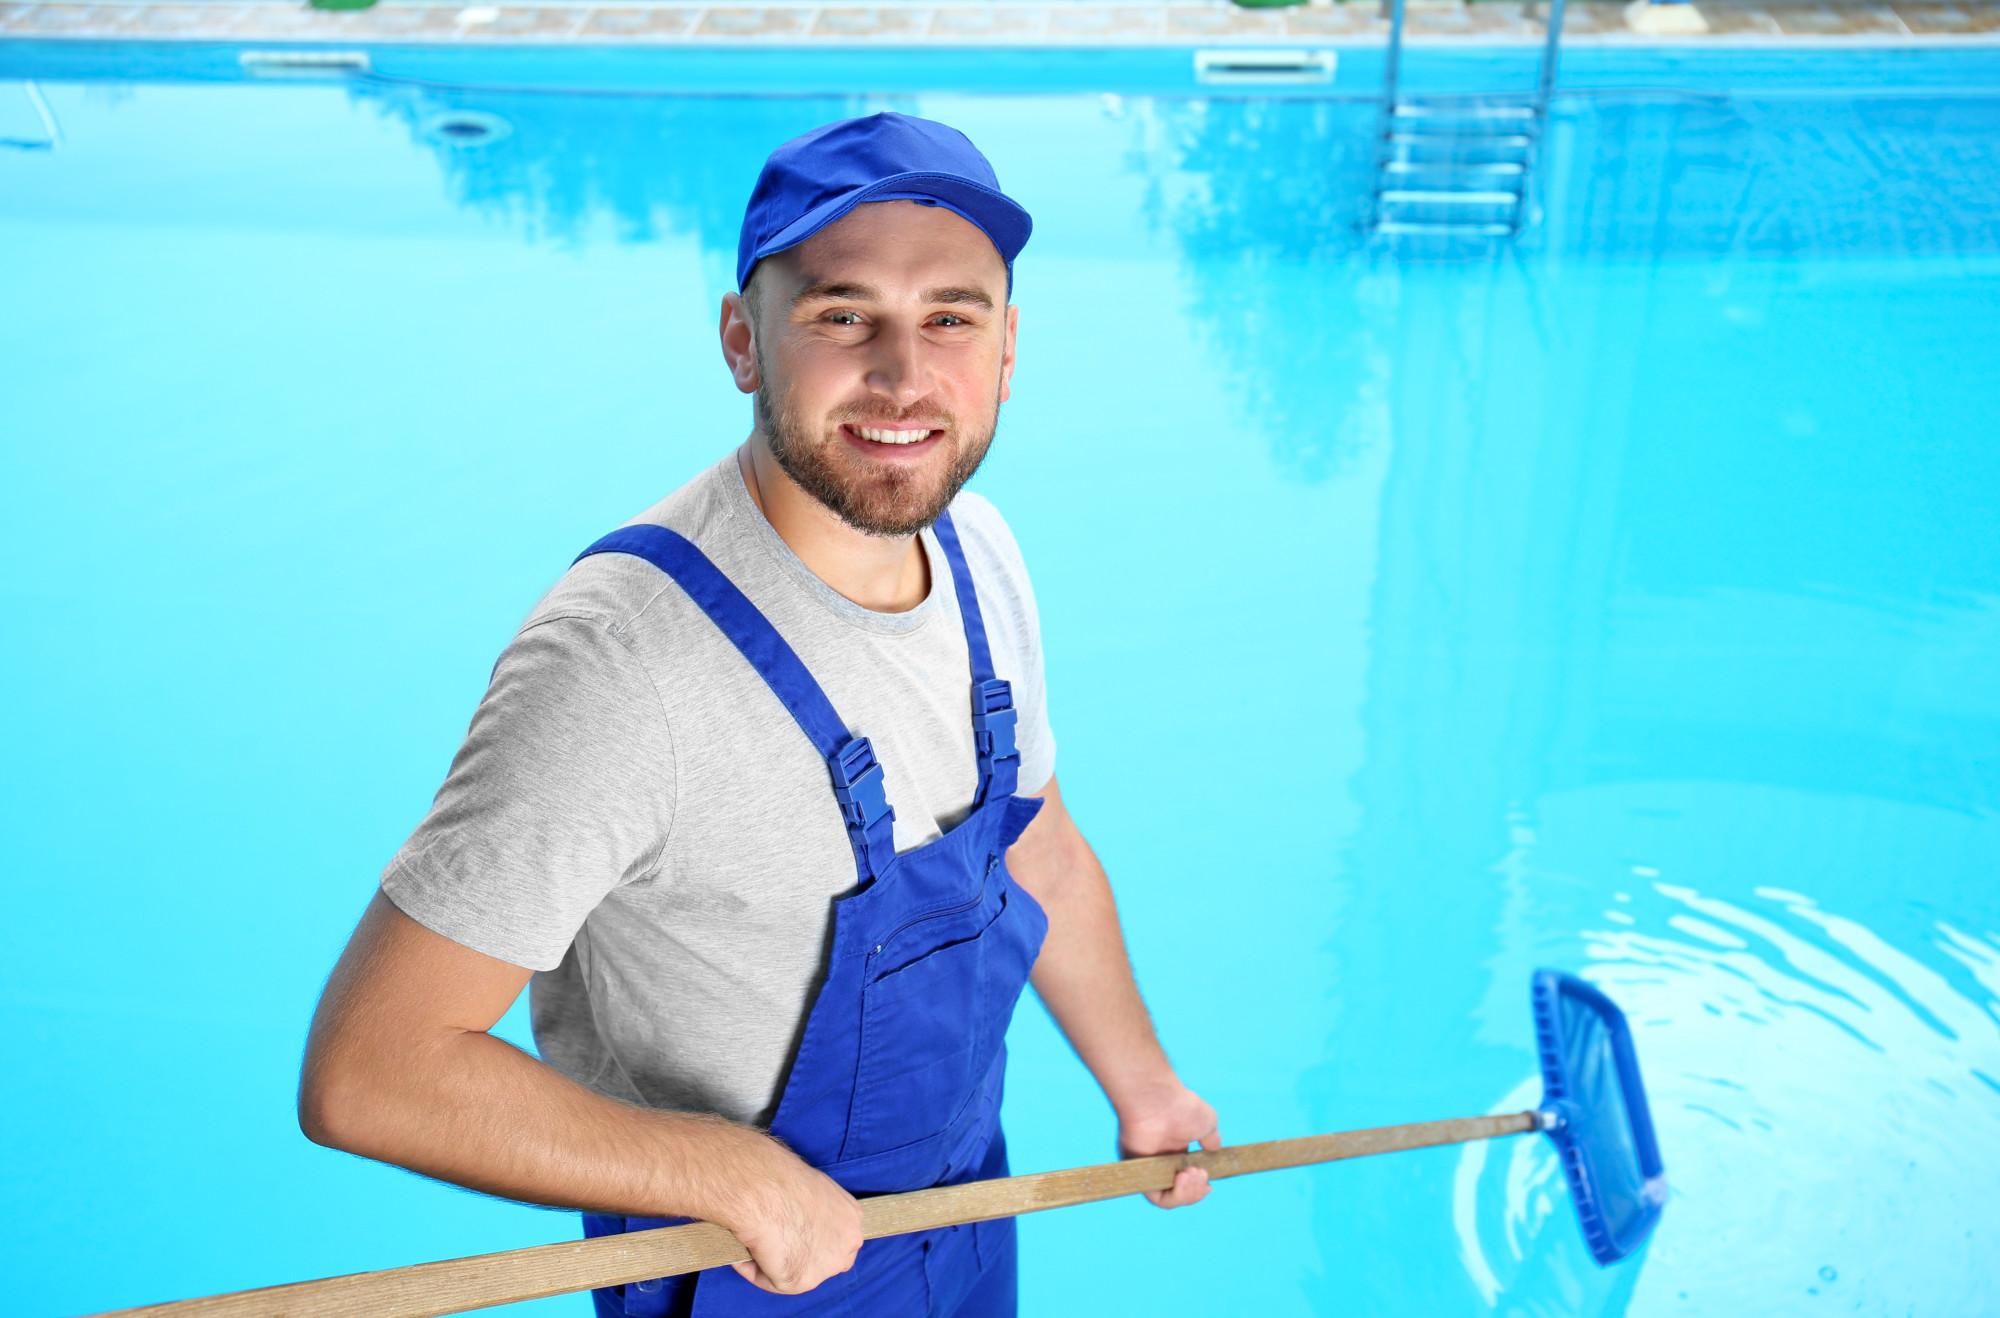 Pool-Maintenance-Services-A2.jpeg